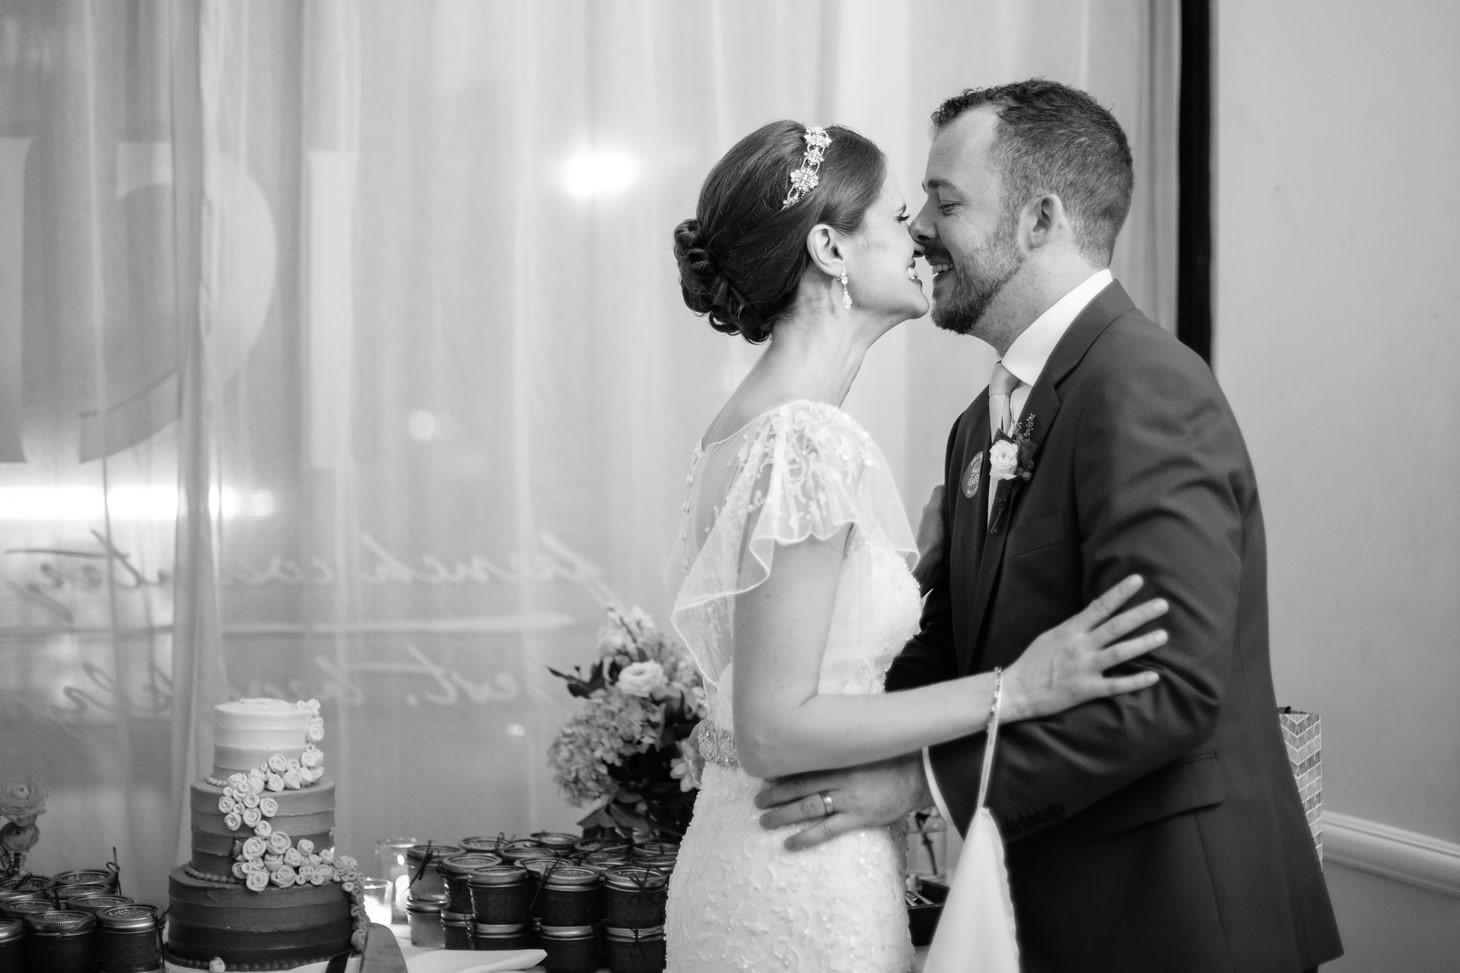 x-brooklyn-restaurant-wedding-nyc-weddingi-photographer-smitten-chickens189.jpg